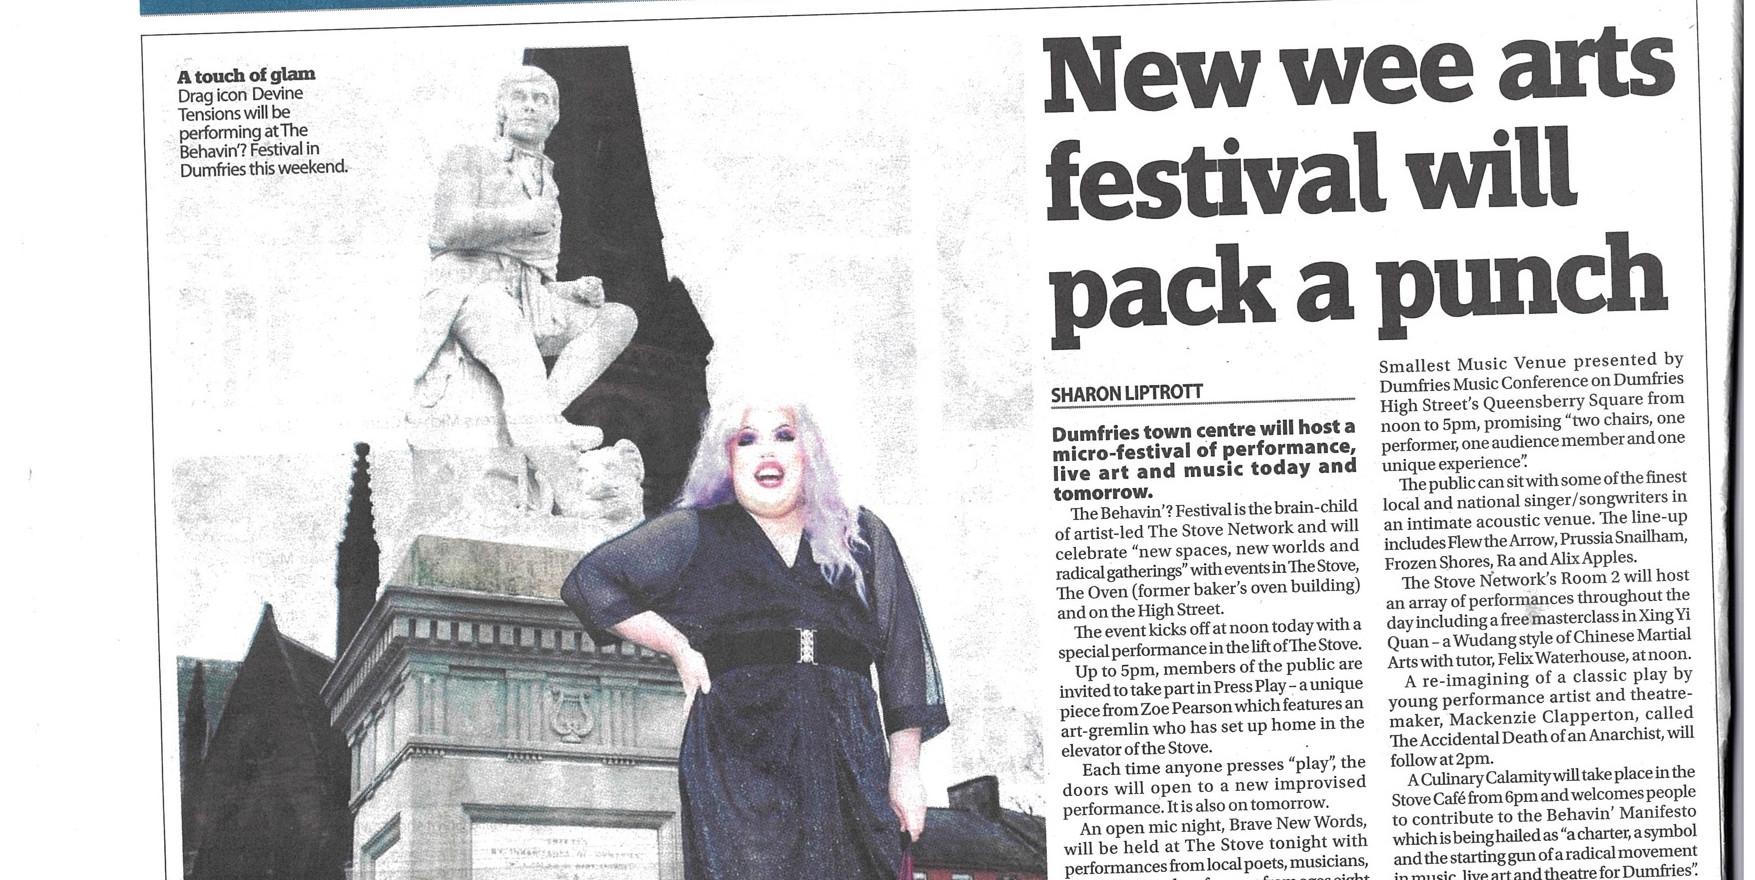 Behavin'? Festival Press Release #2